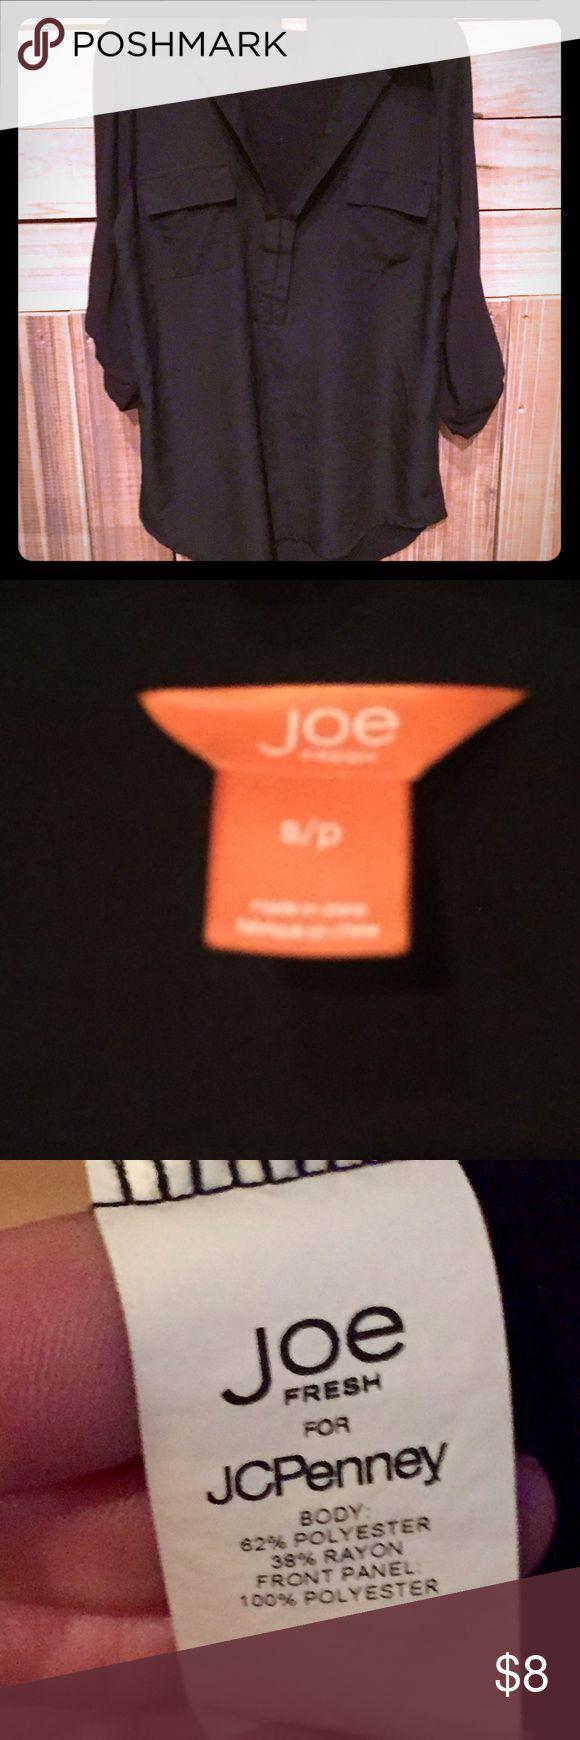 Joe Fresh black 3/4 sleeve blouse Joe Fresh black 3/4 sleeve blouse Joe Fresh Tops Blouses